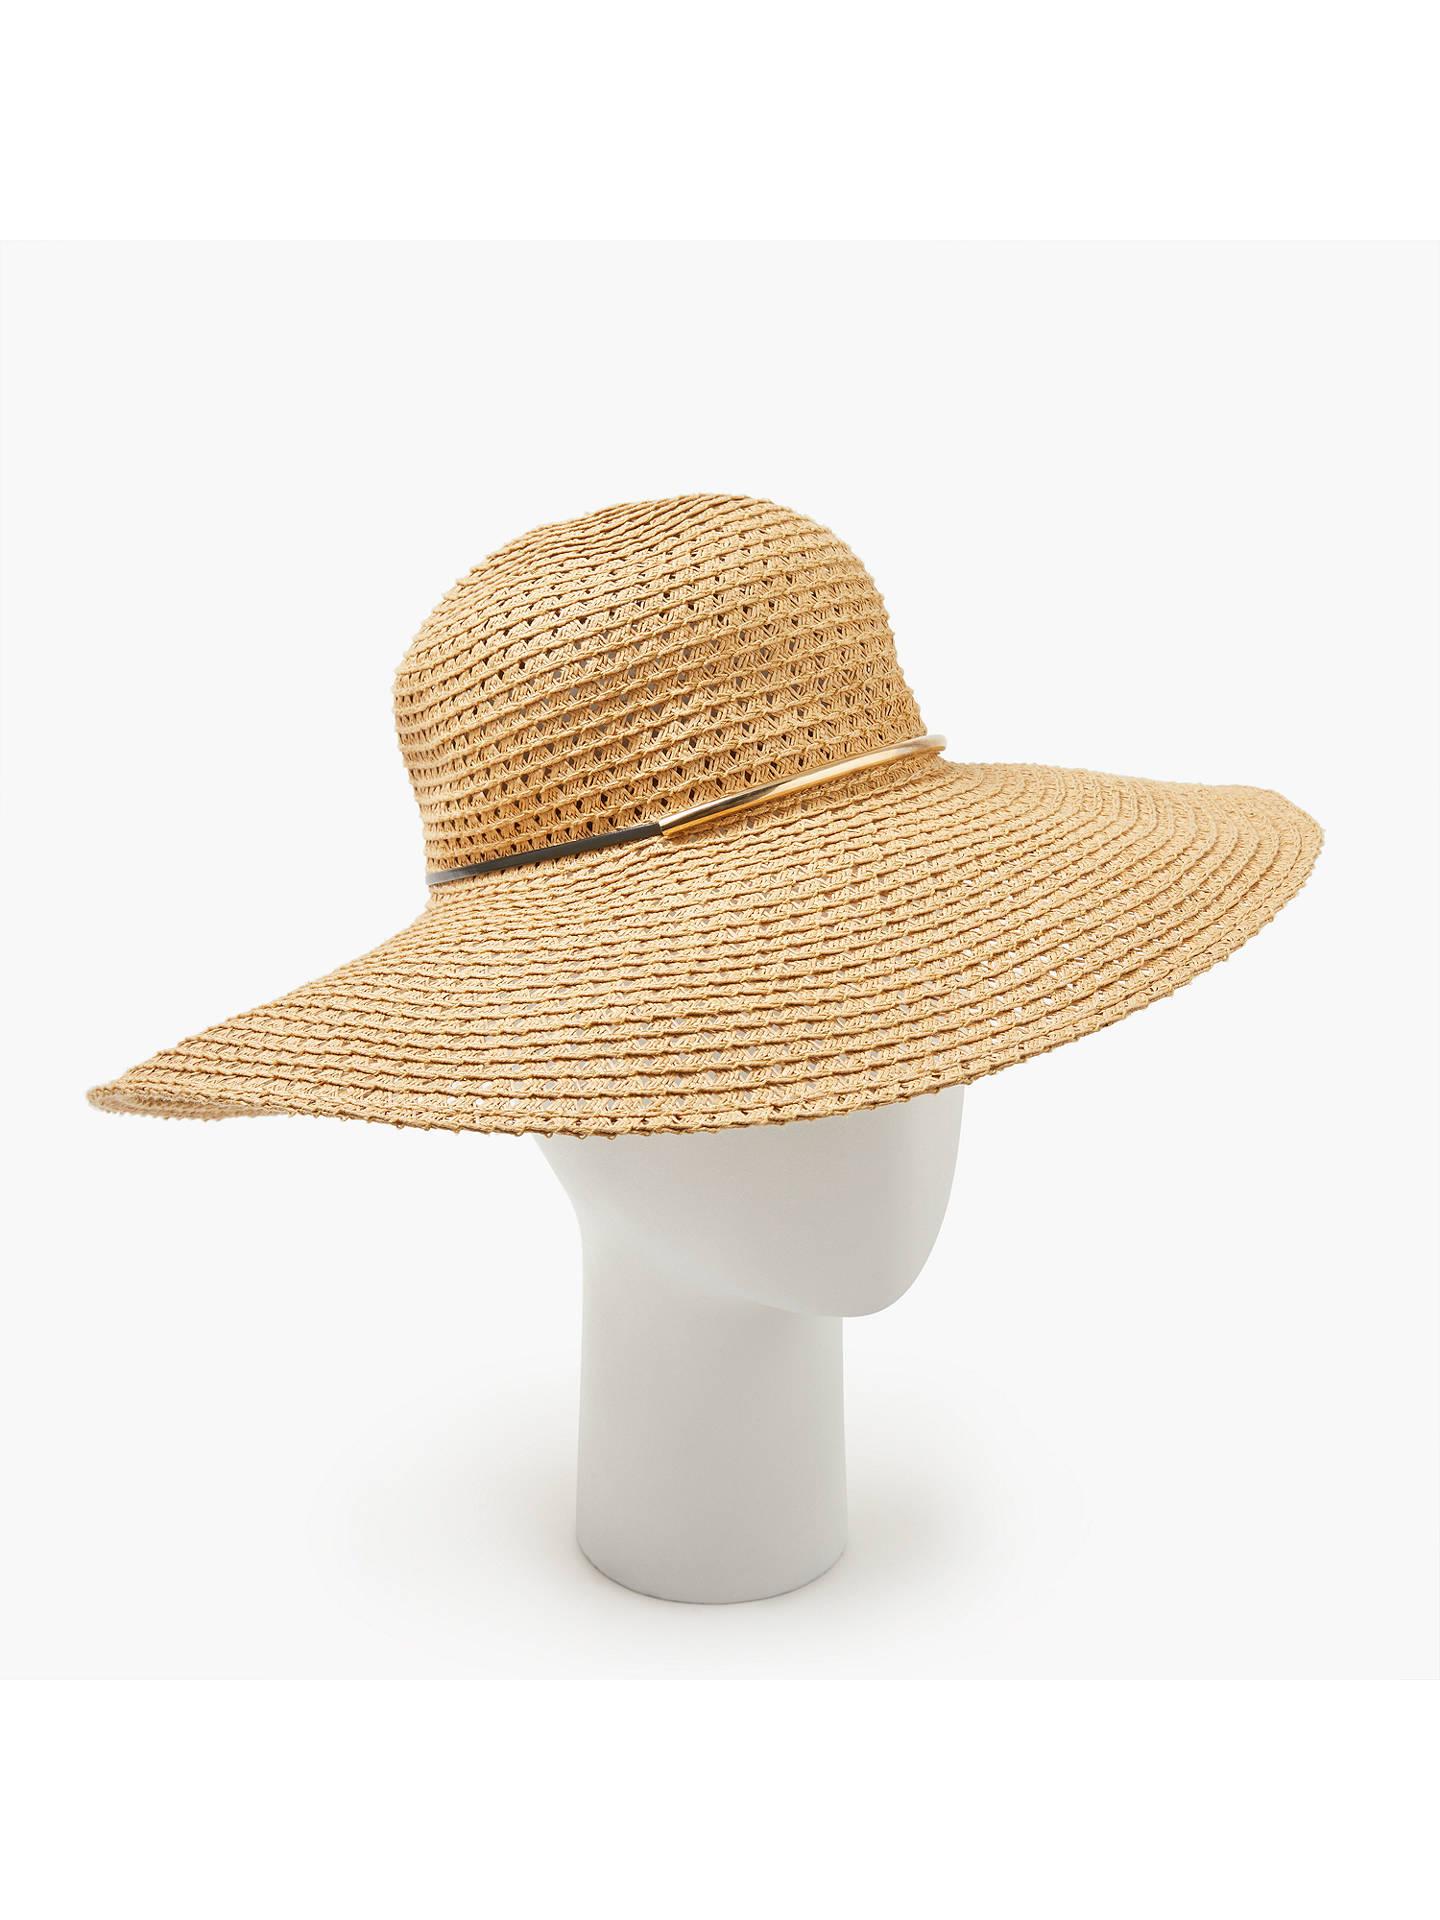 43f1d452 Buy John Lewis & Partners Packable Metal Trim Braided Floppy Hat, Natural  Online at johnlewis ...